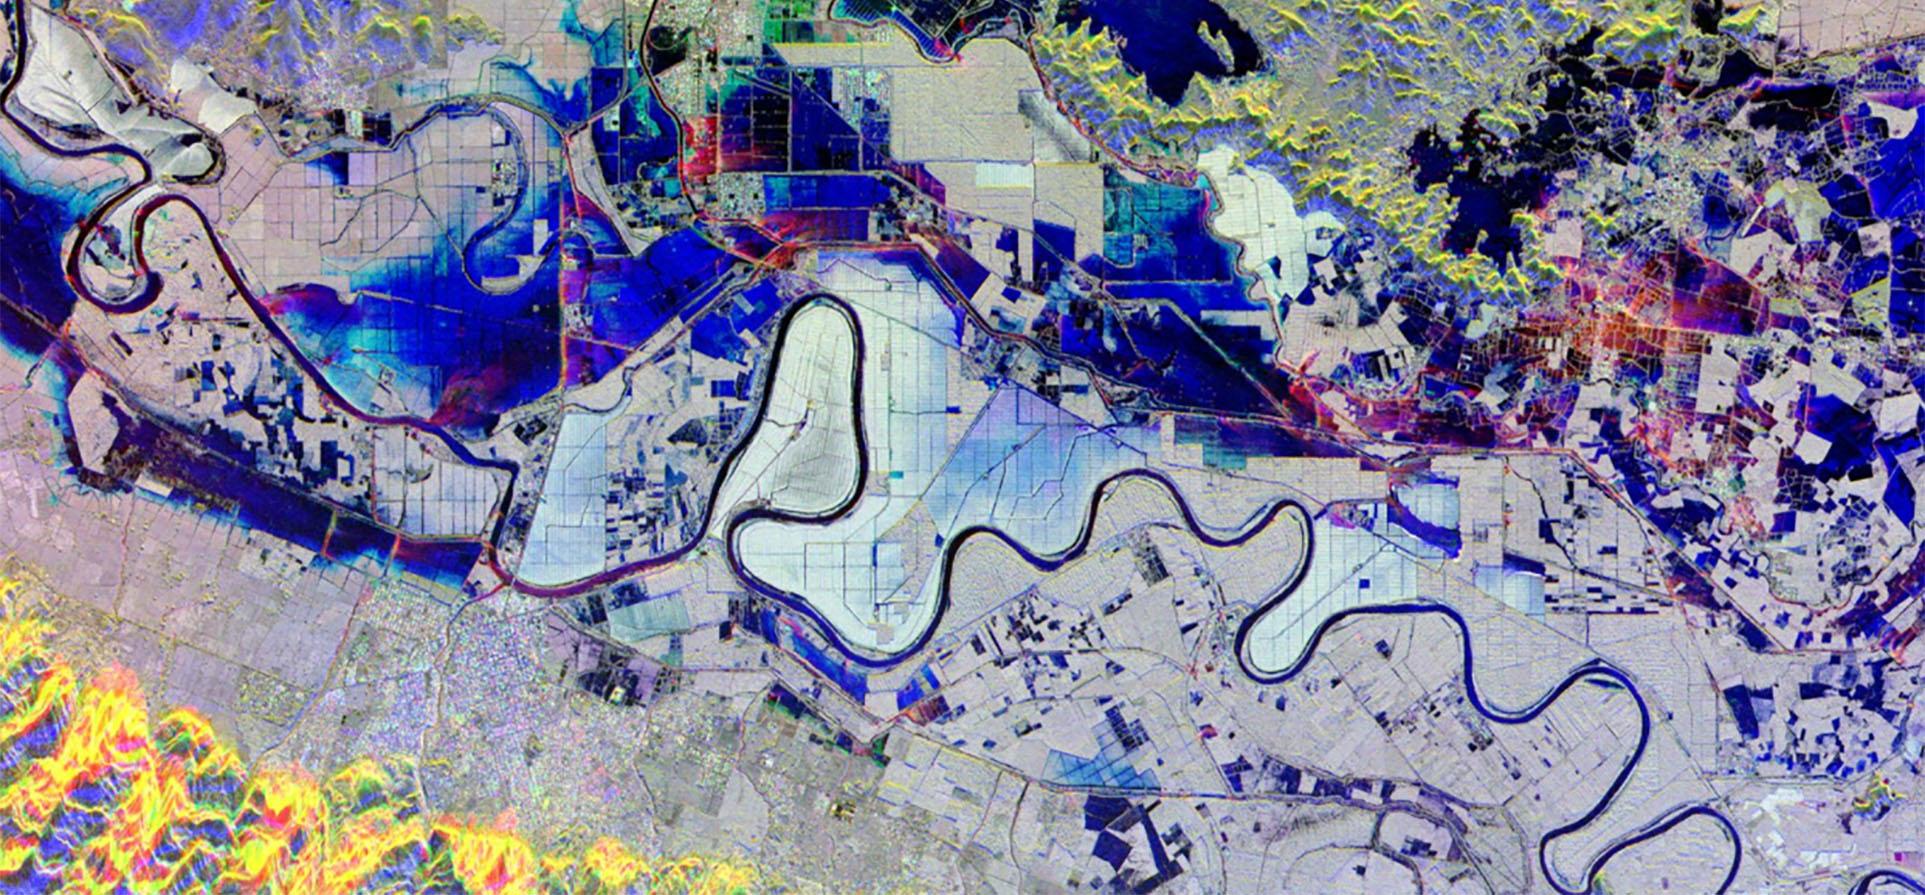 flood-monitoring-iota3